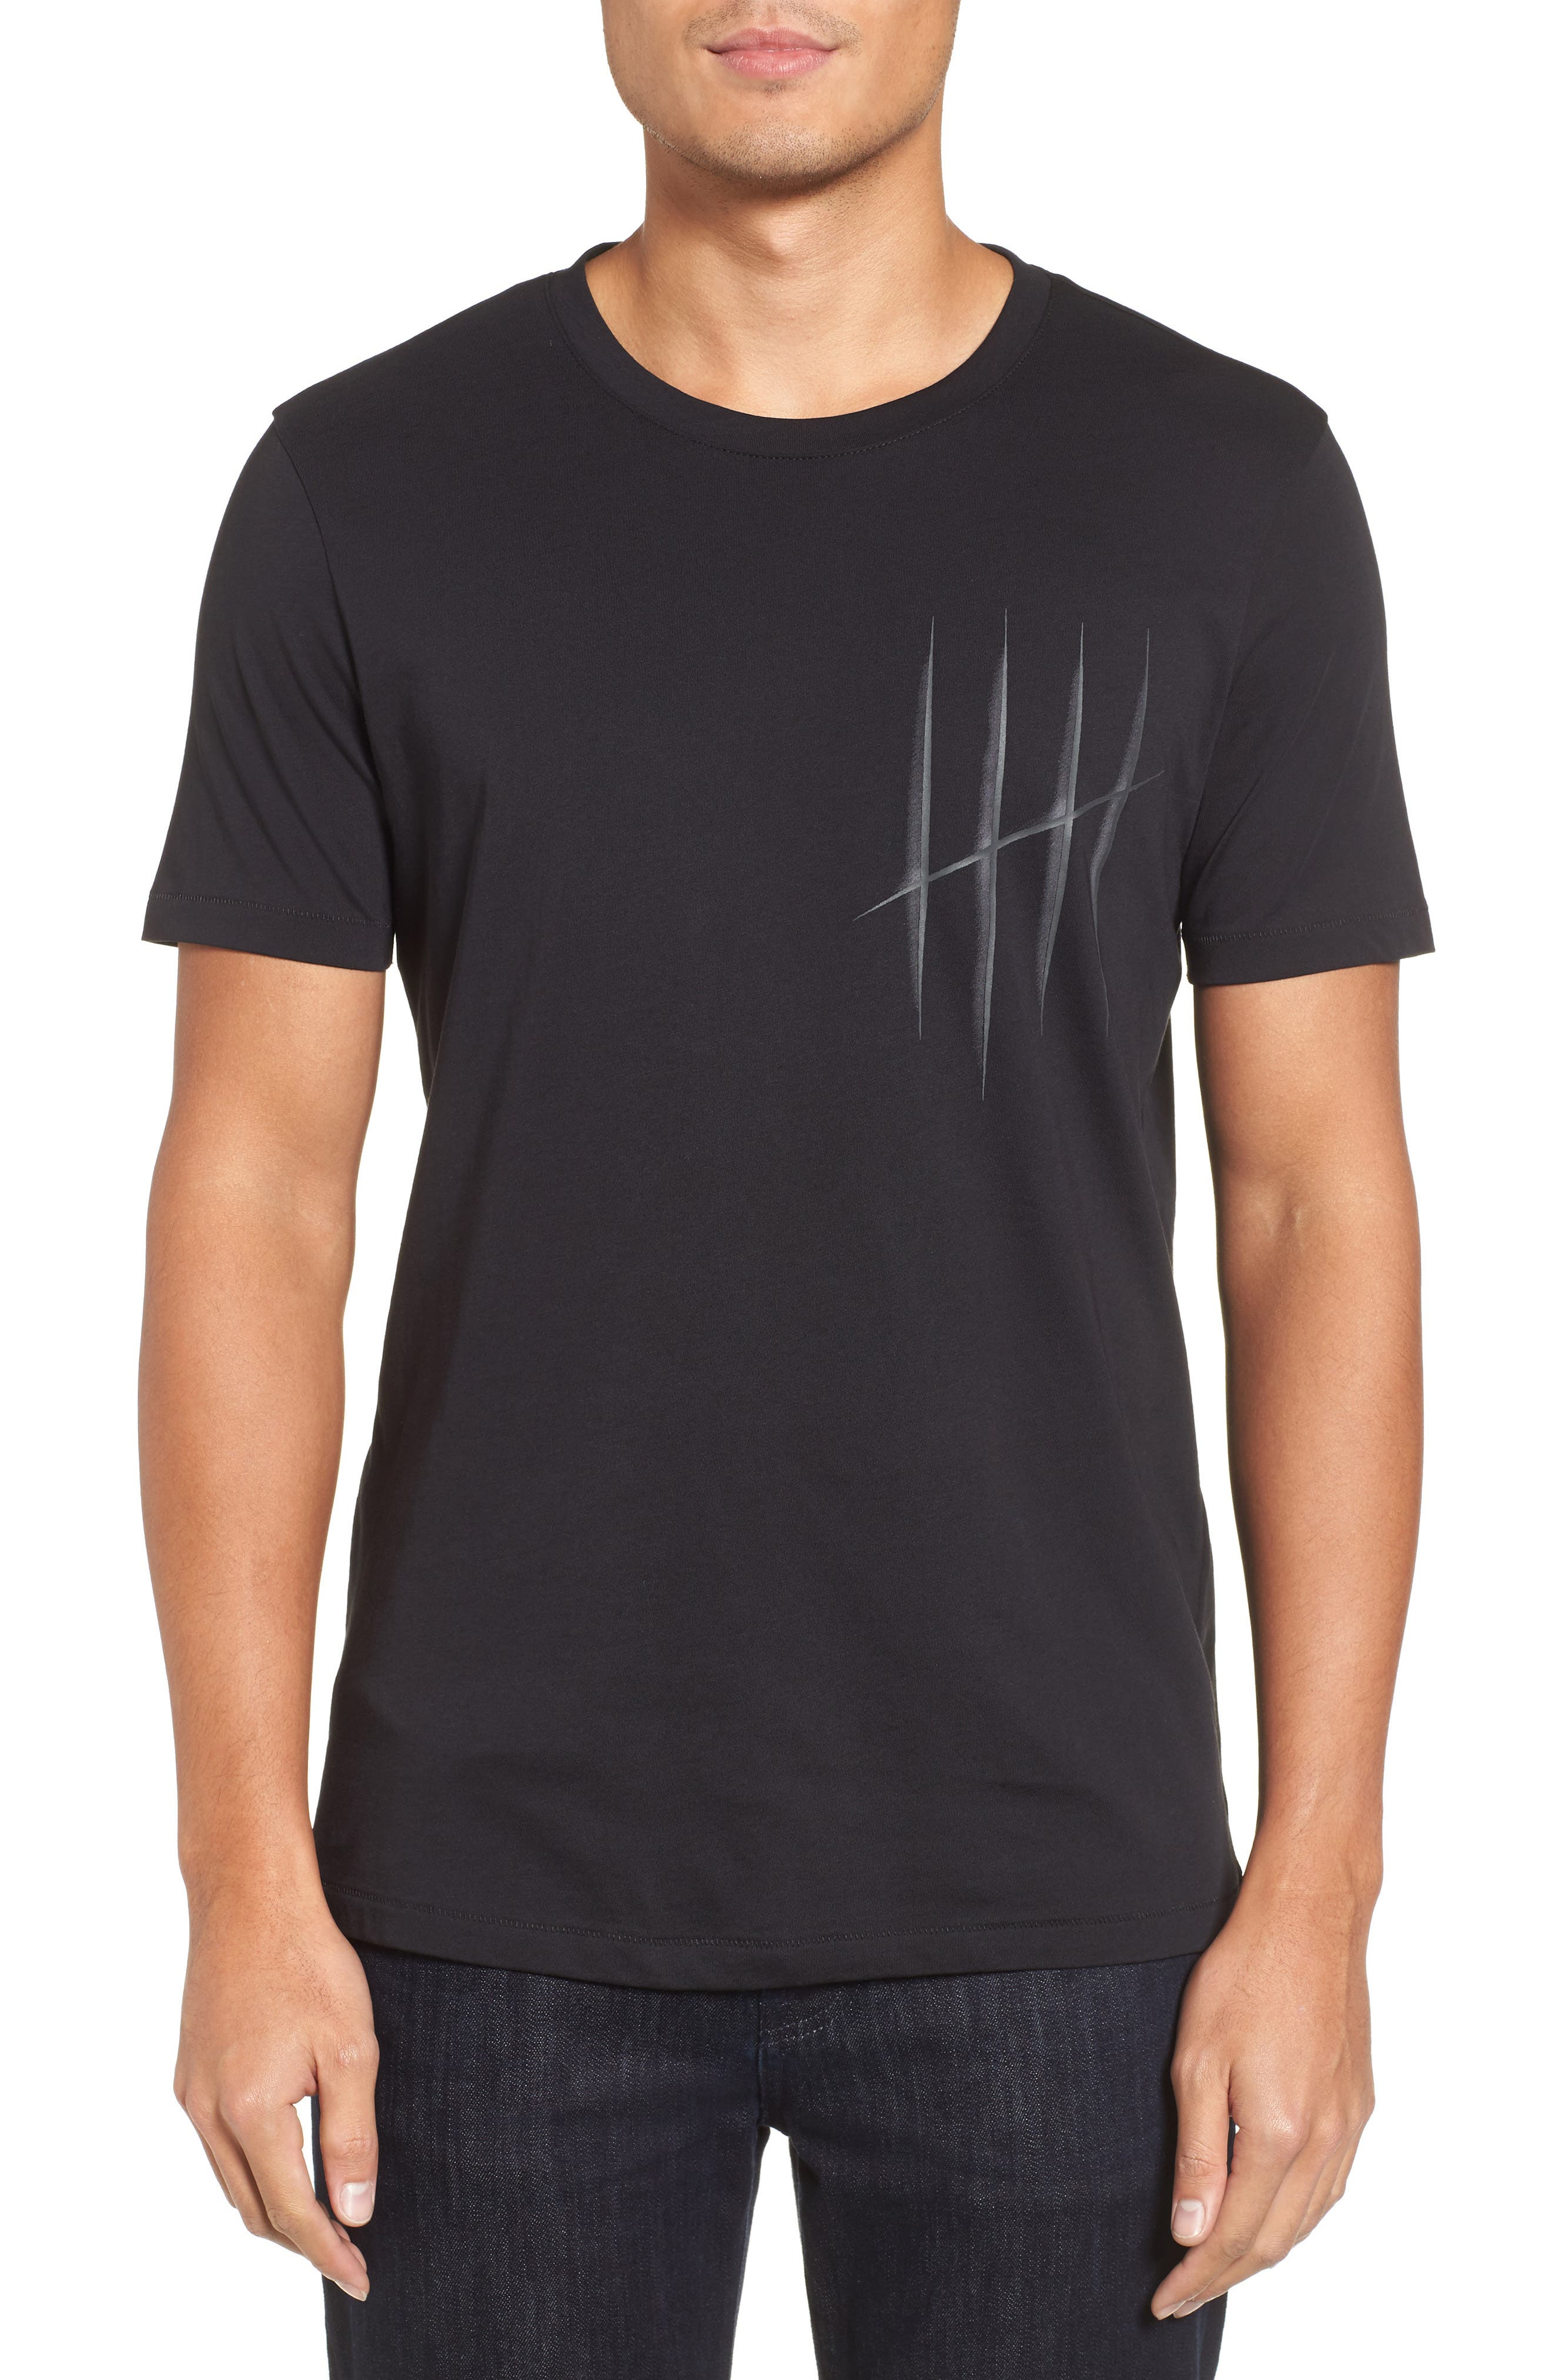 Hugo Boss Drison Hashmark Graphic T-Shirt,                             Main thumbnail 1, color,                             001